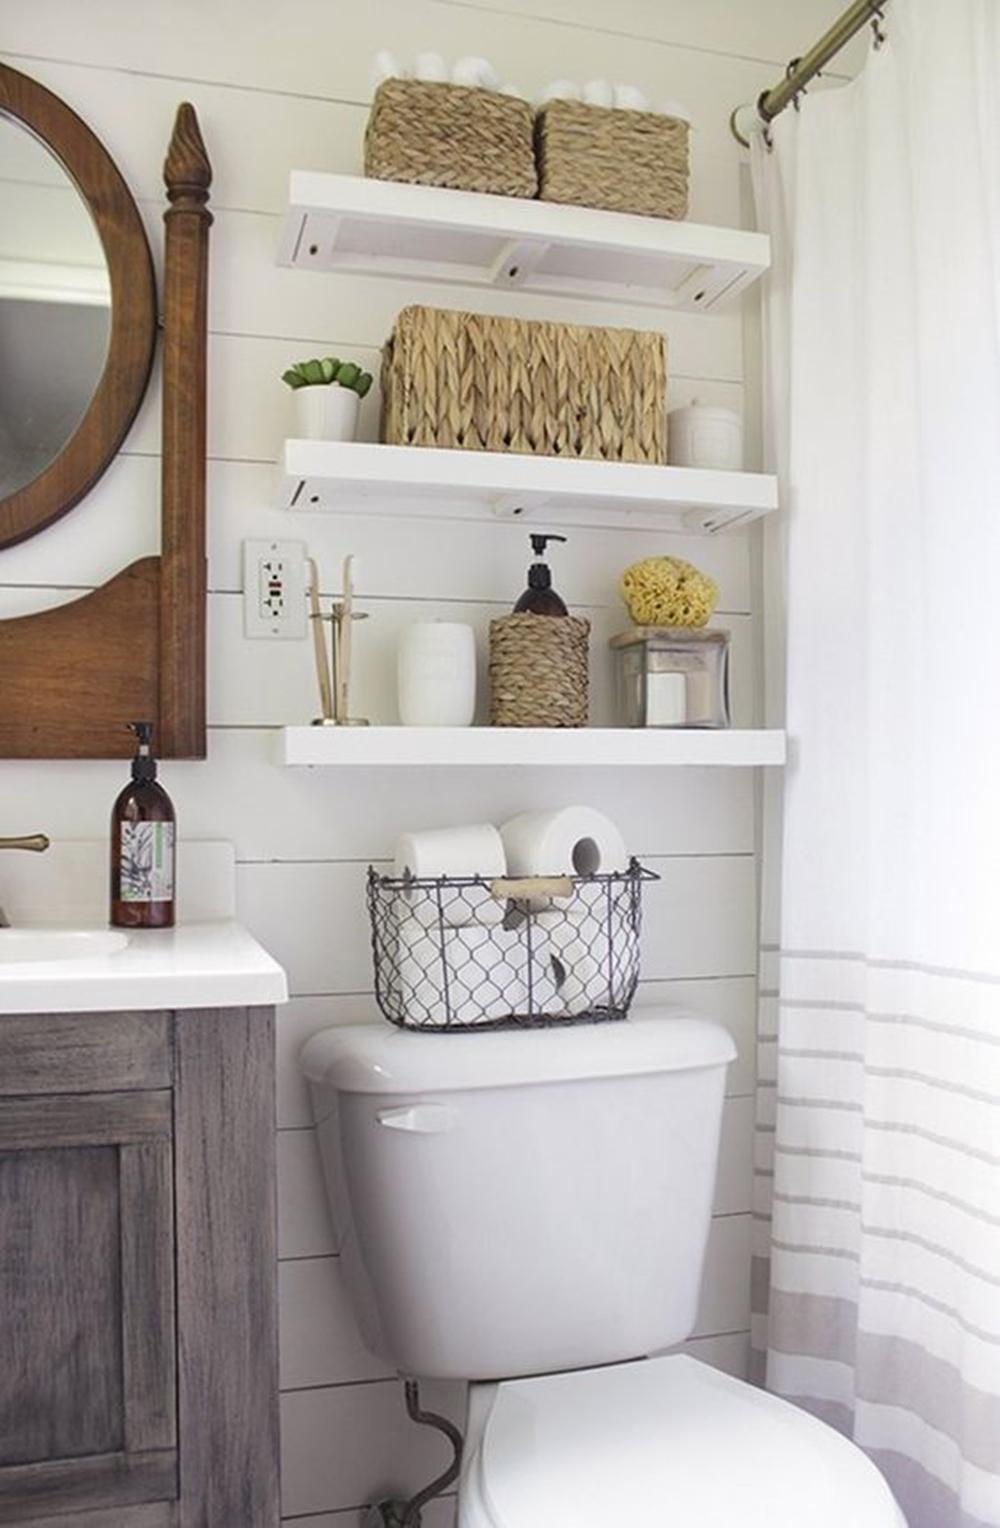 30 Nifty Bathroom Storage Ideas To Make Use Of Every Bit Of regarding size 1000 X 1528